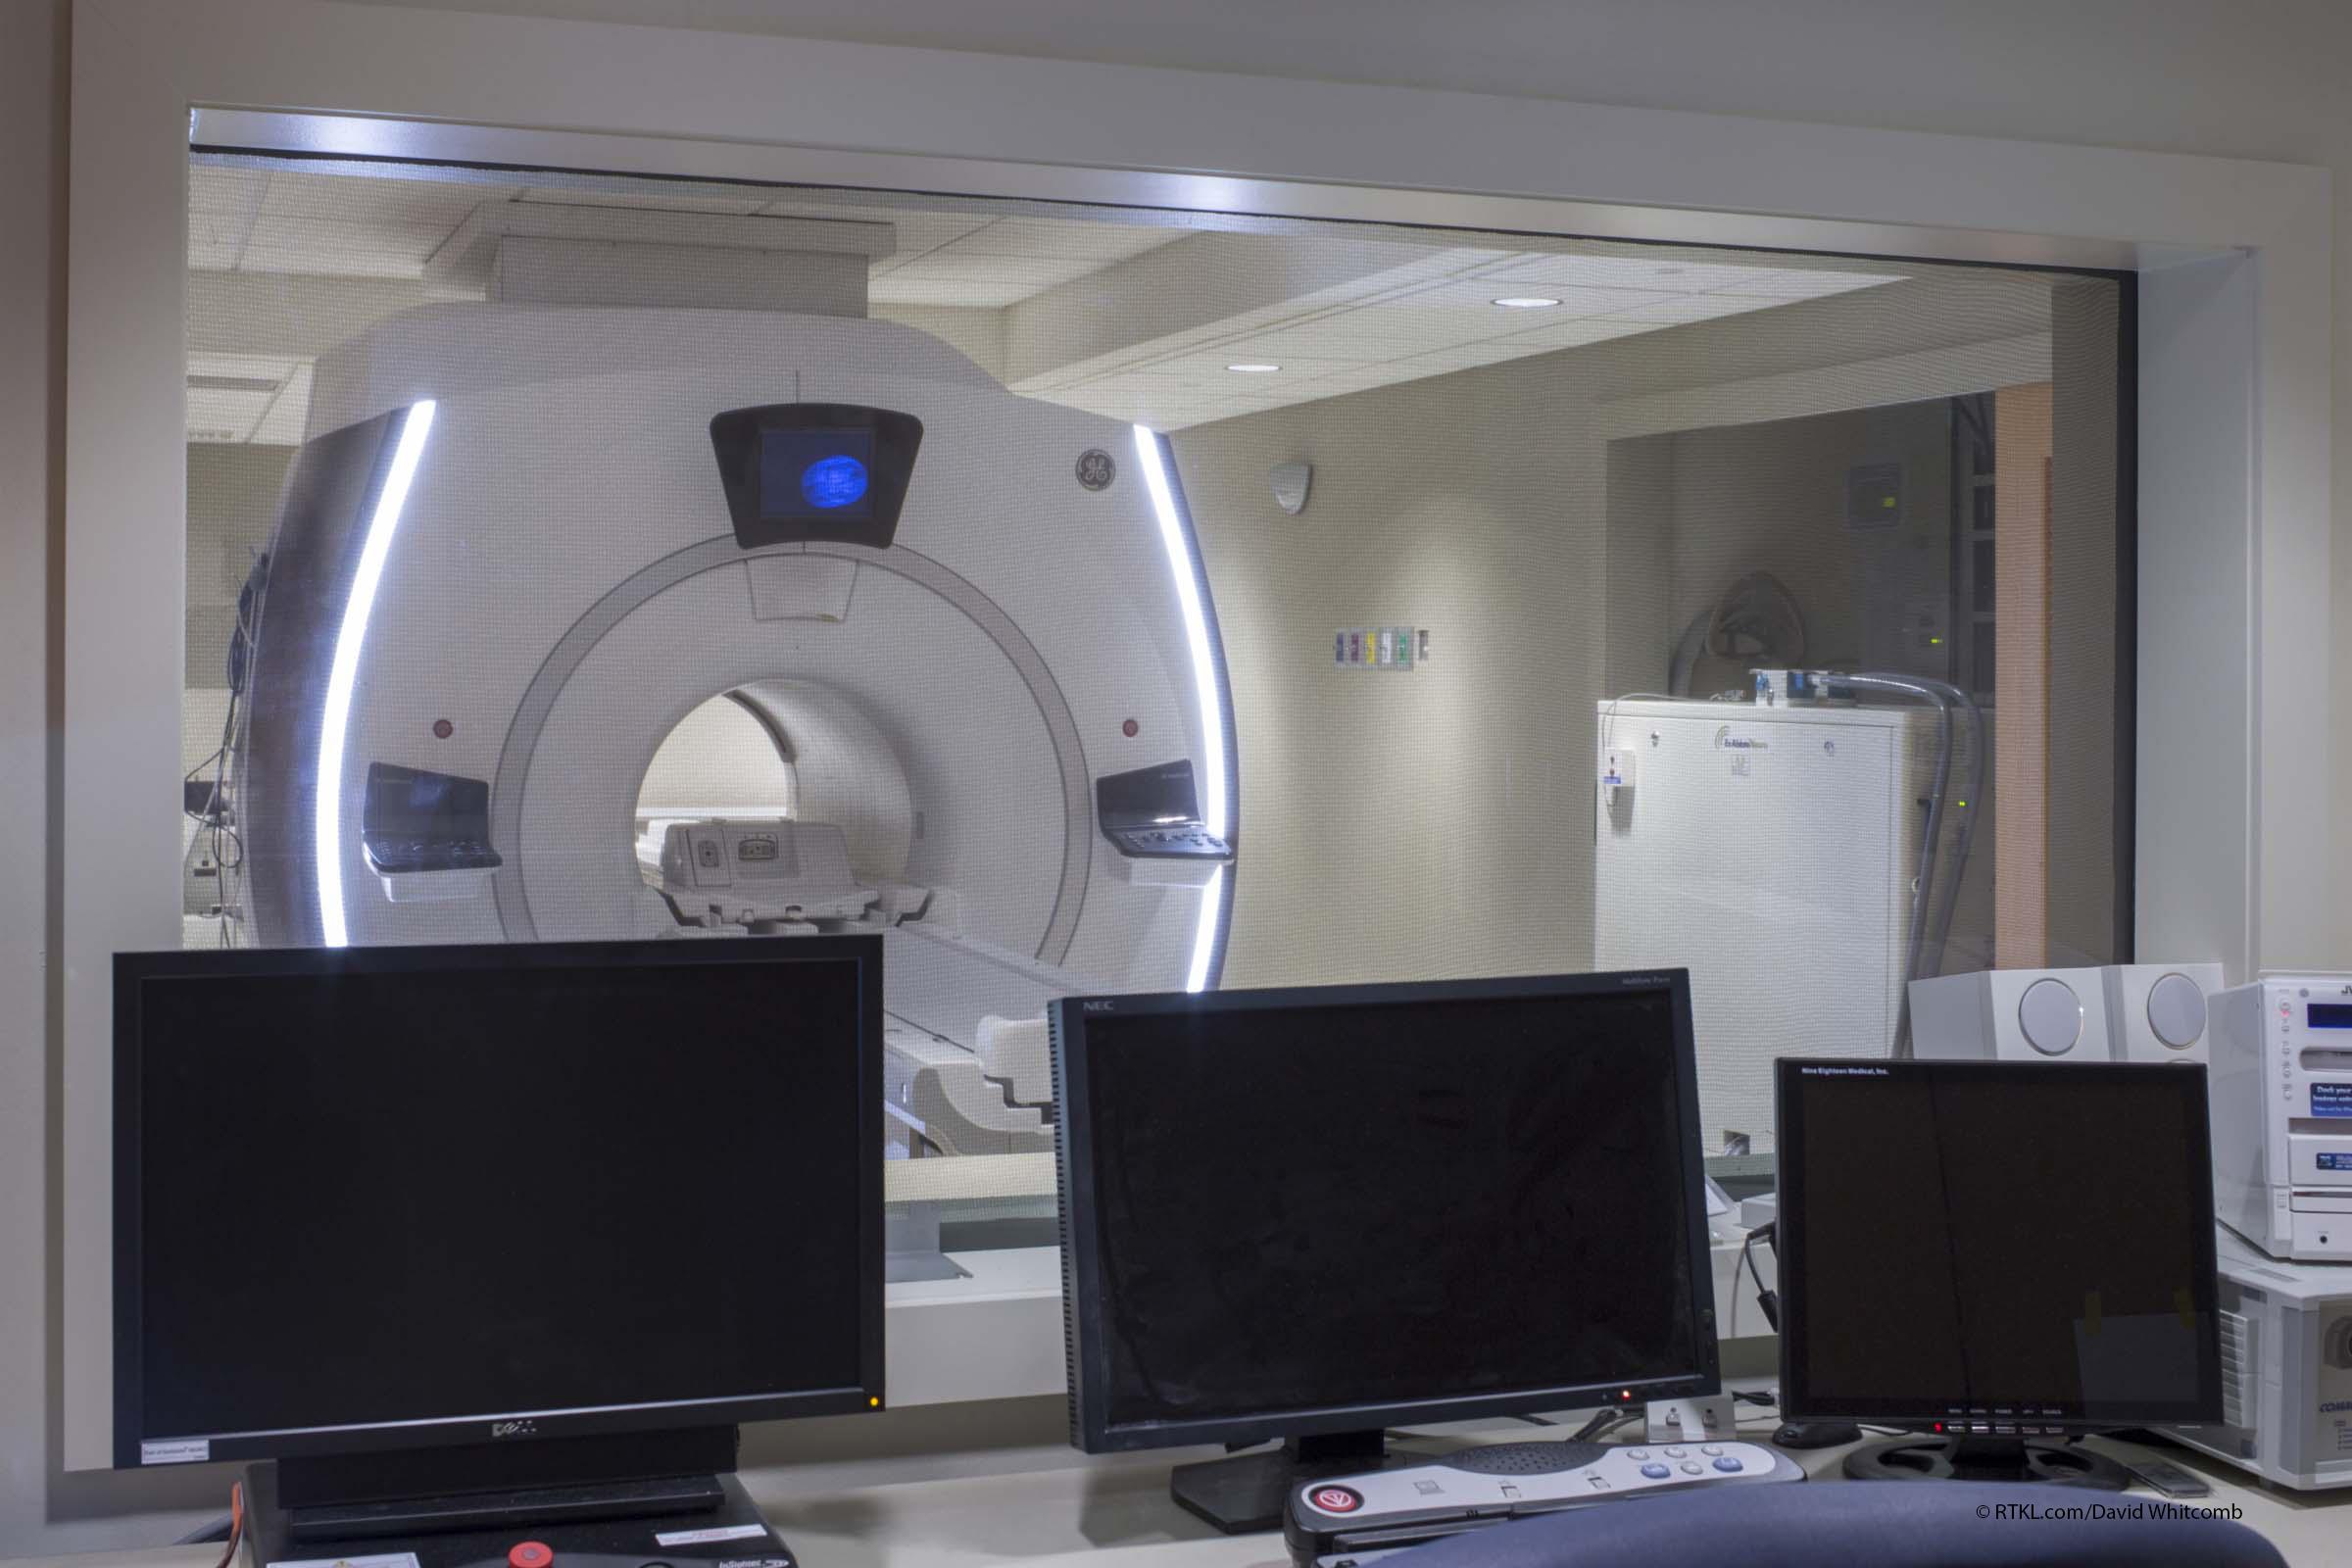 Downloads: Center for Integration of Molecular Imaging and